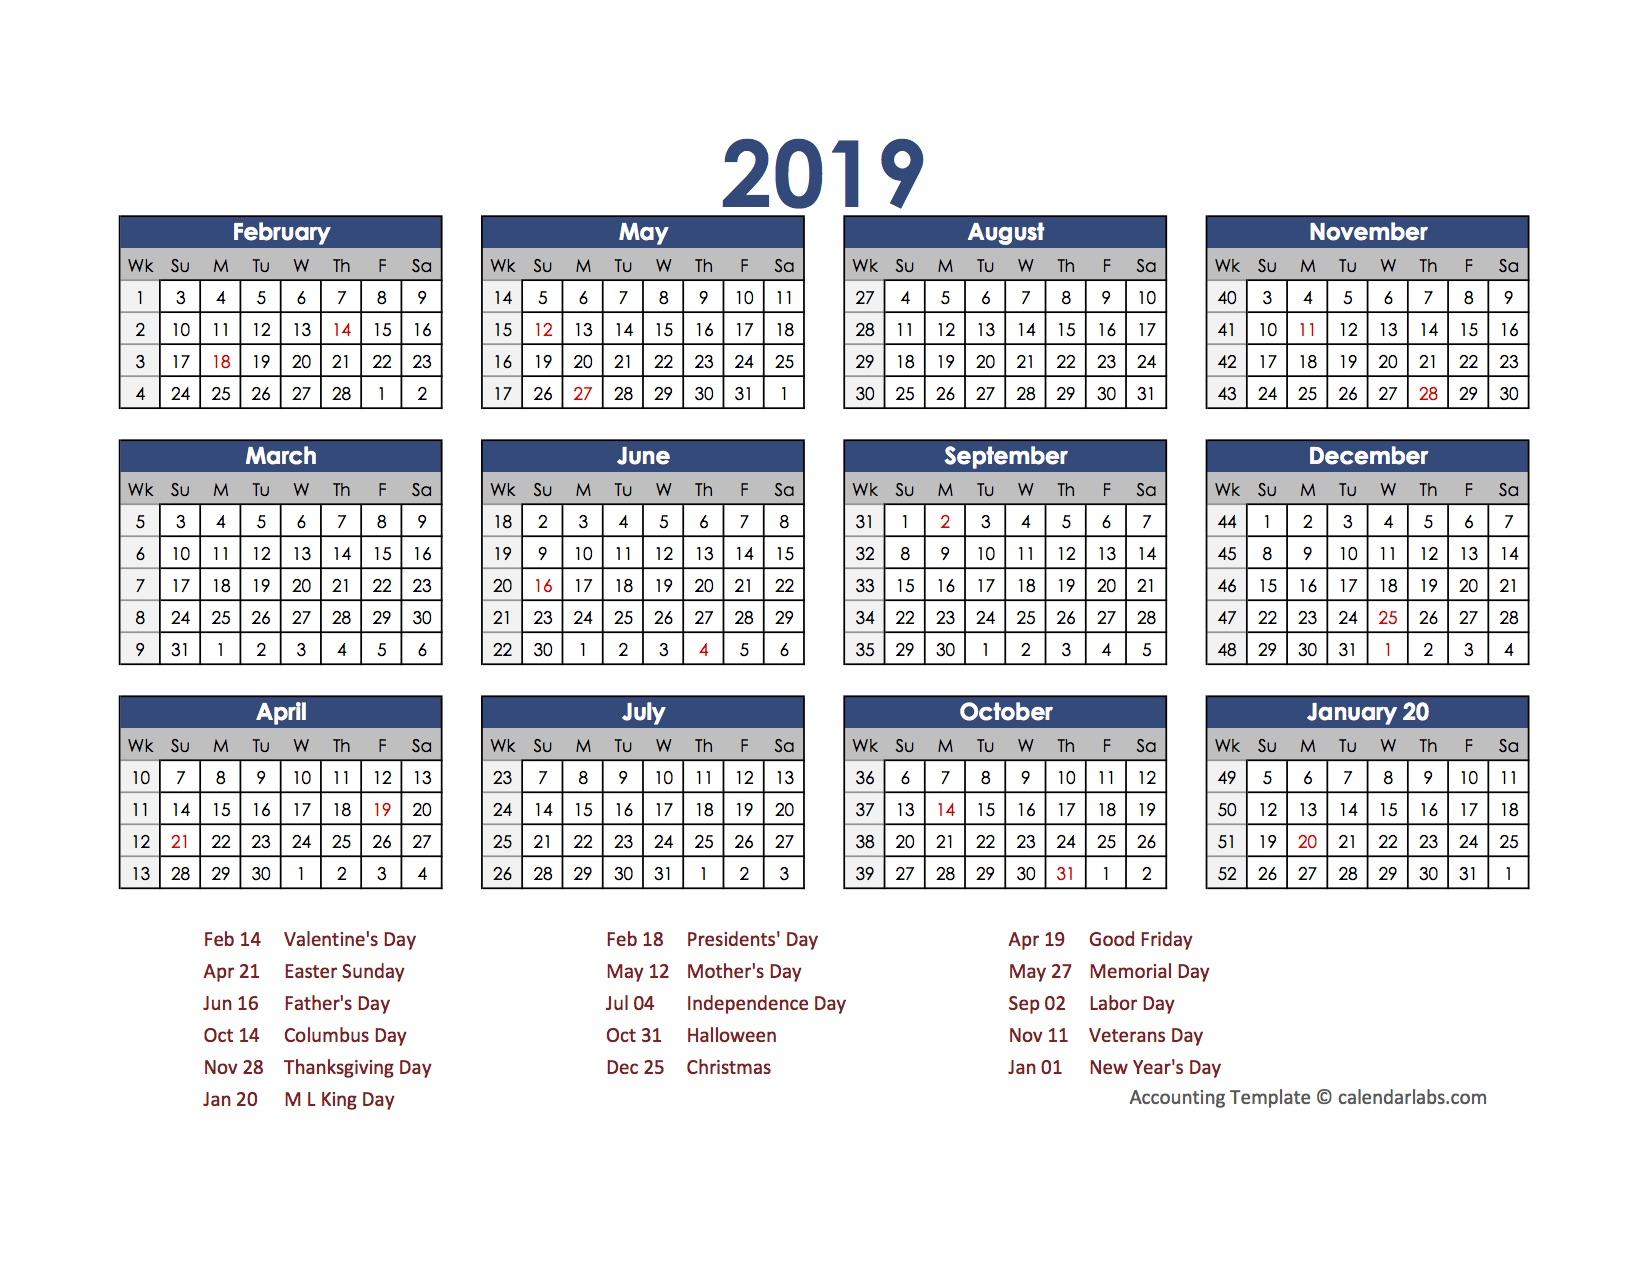 2019 Accounting Calendar 4-5-4 - Free Printable Templates